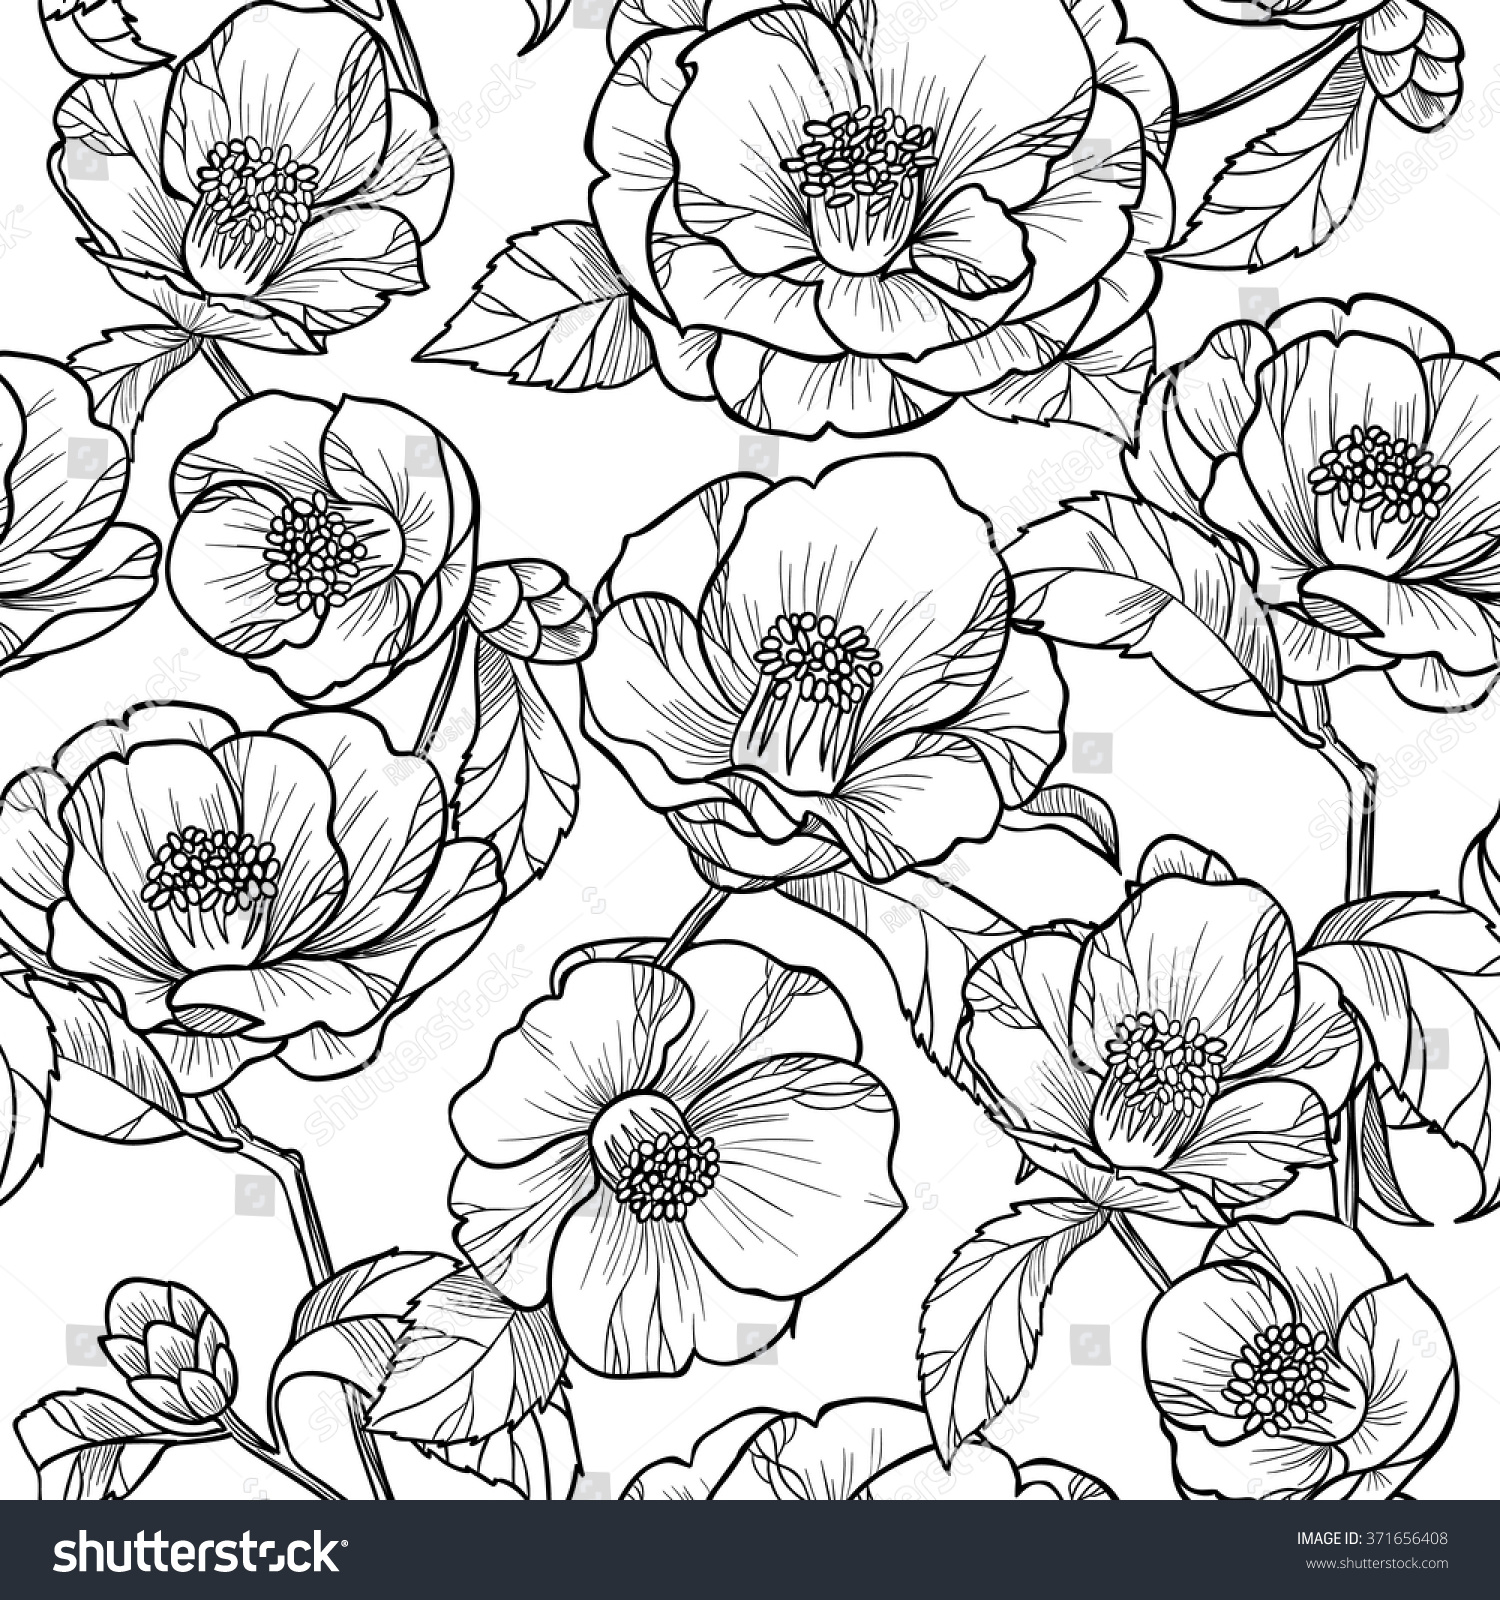 Black white flowers camelliavector seamless pattern stok vektr black white flowers camelliavector seamless pattern stok vektr 371656408 shutterstock mightylinksfo